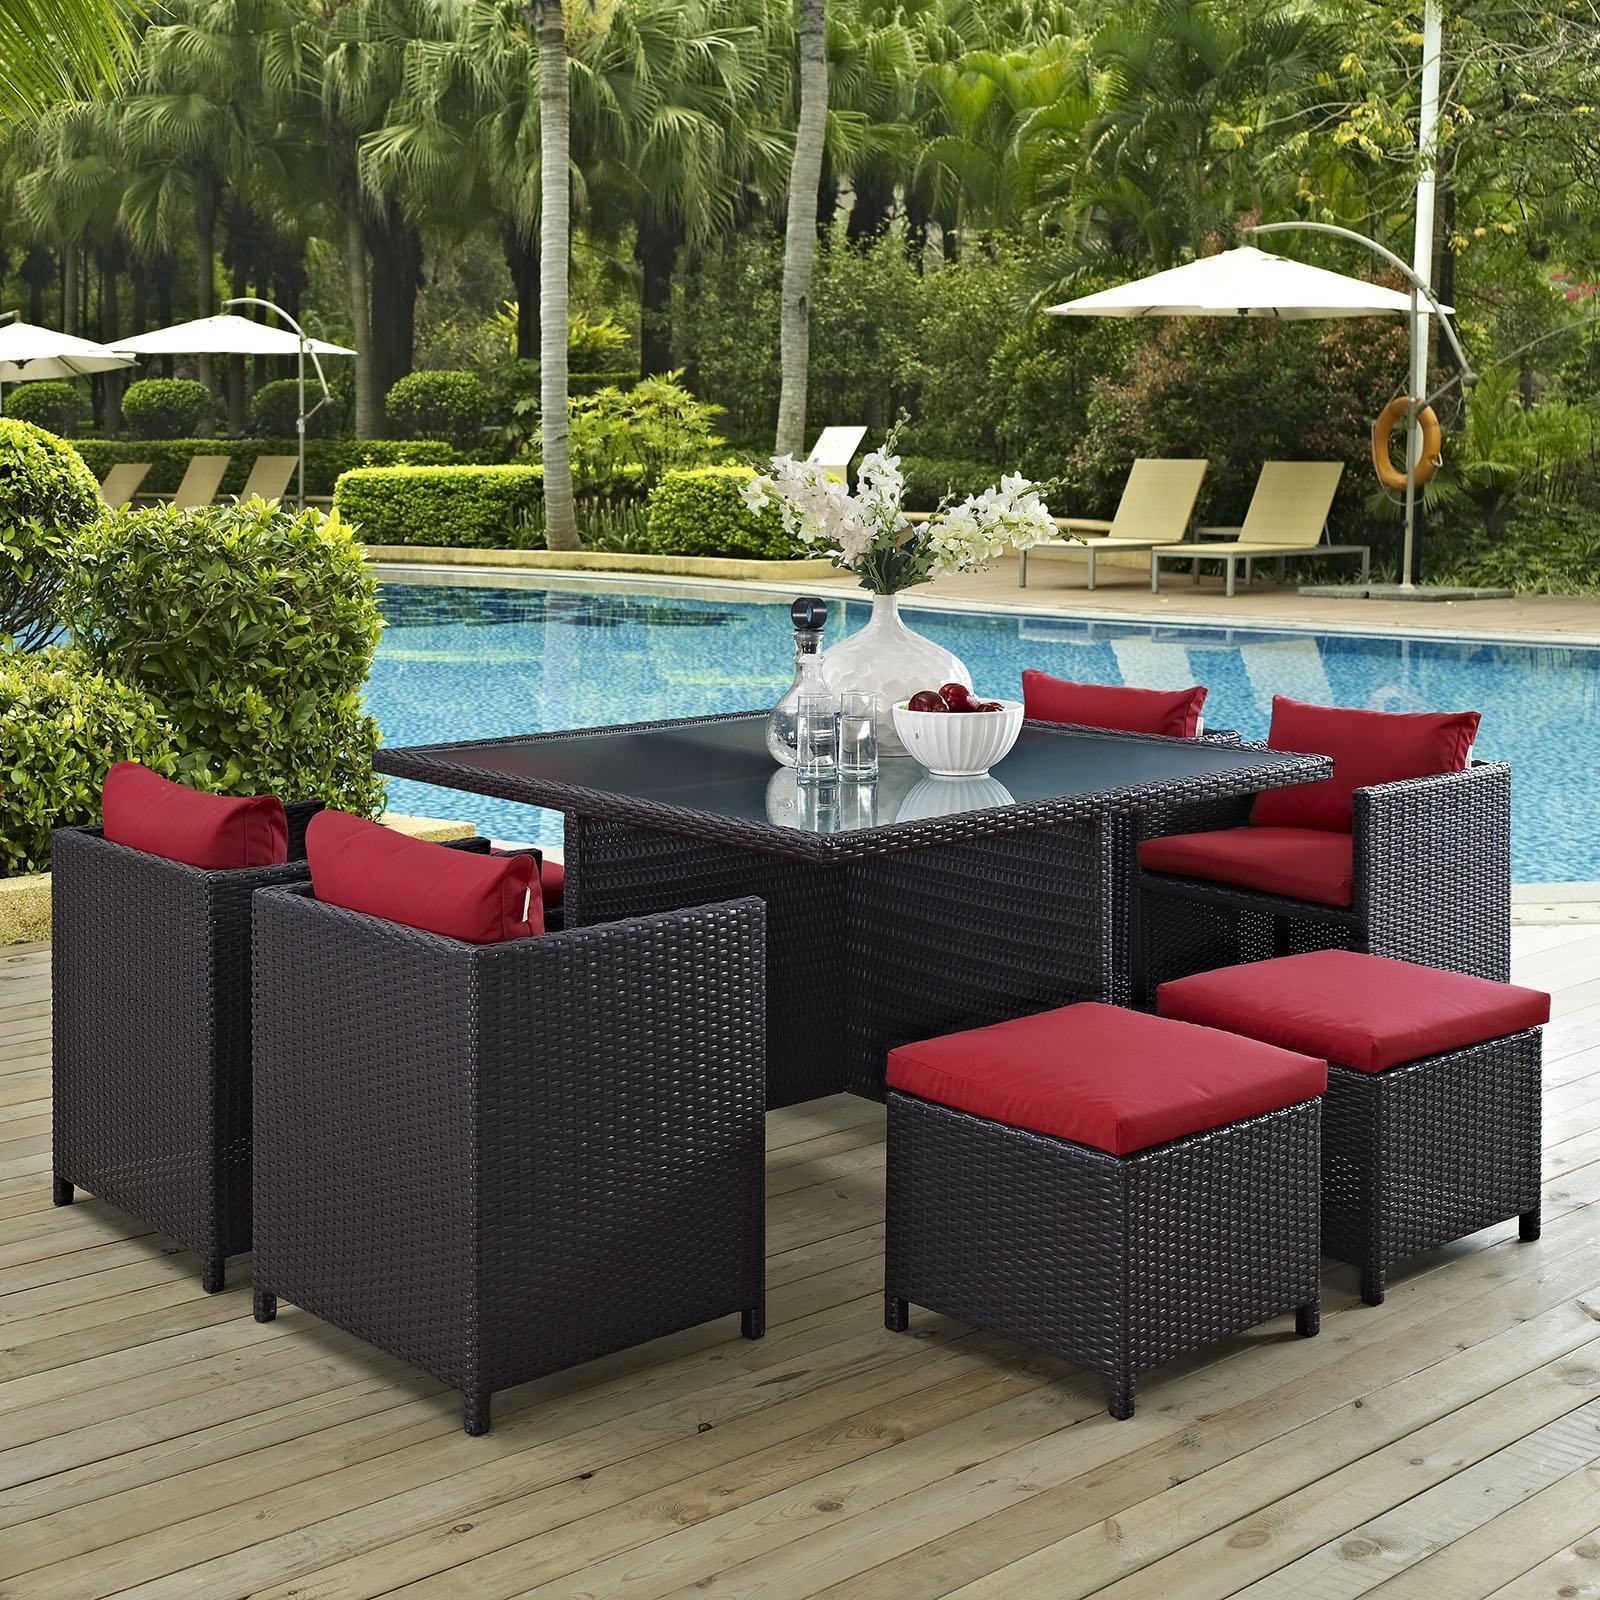 Modway Furniture Modern Inverse 9 Piece Outdoor Patio Dining Set